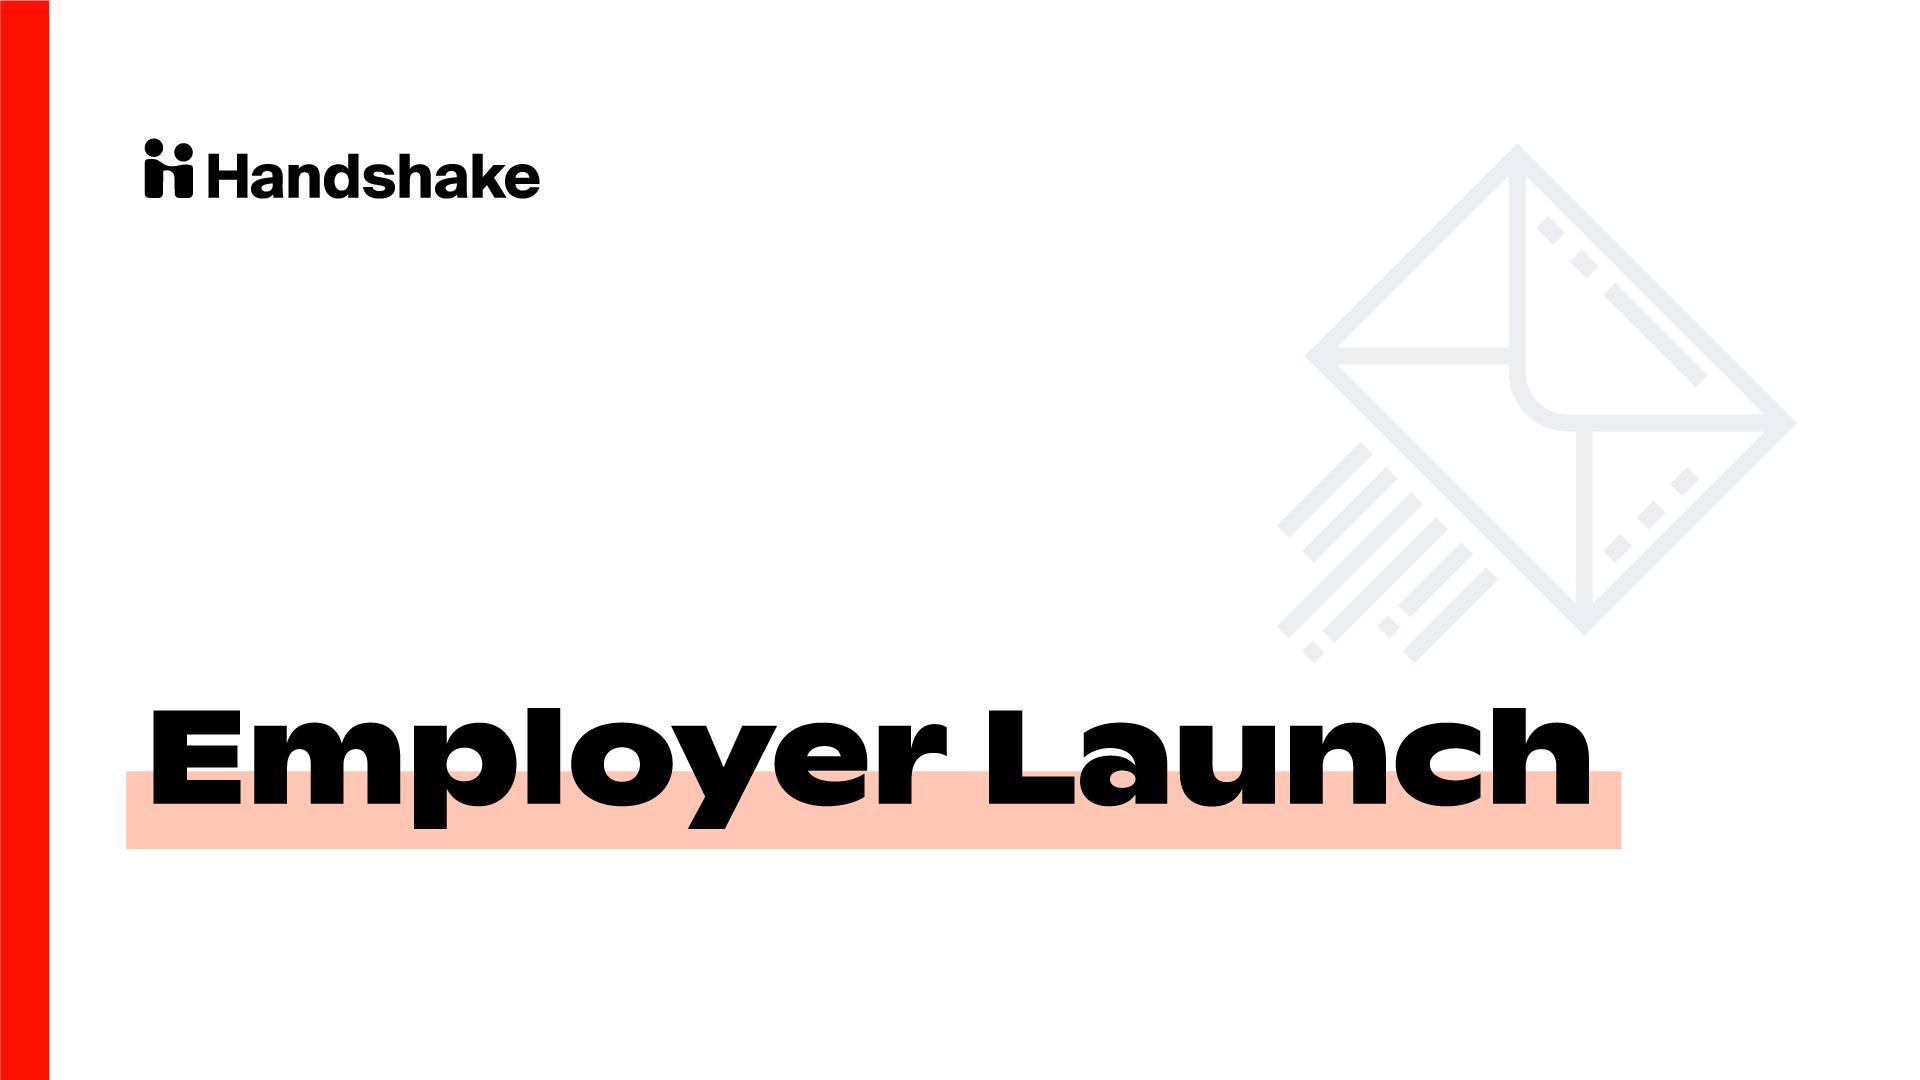 Milestone 6: Employer Launch